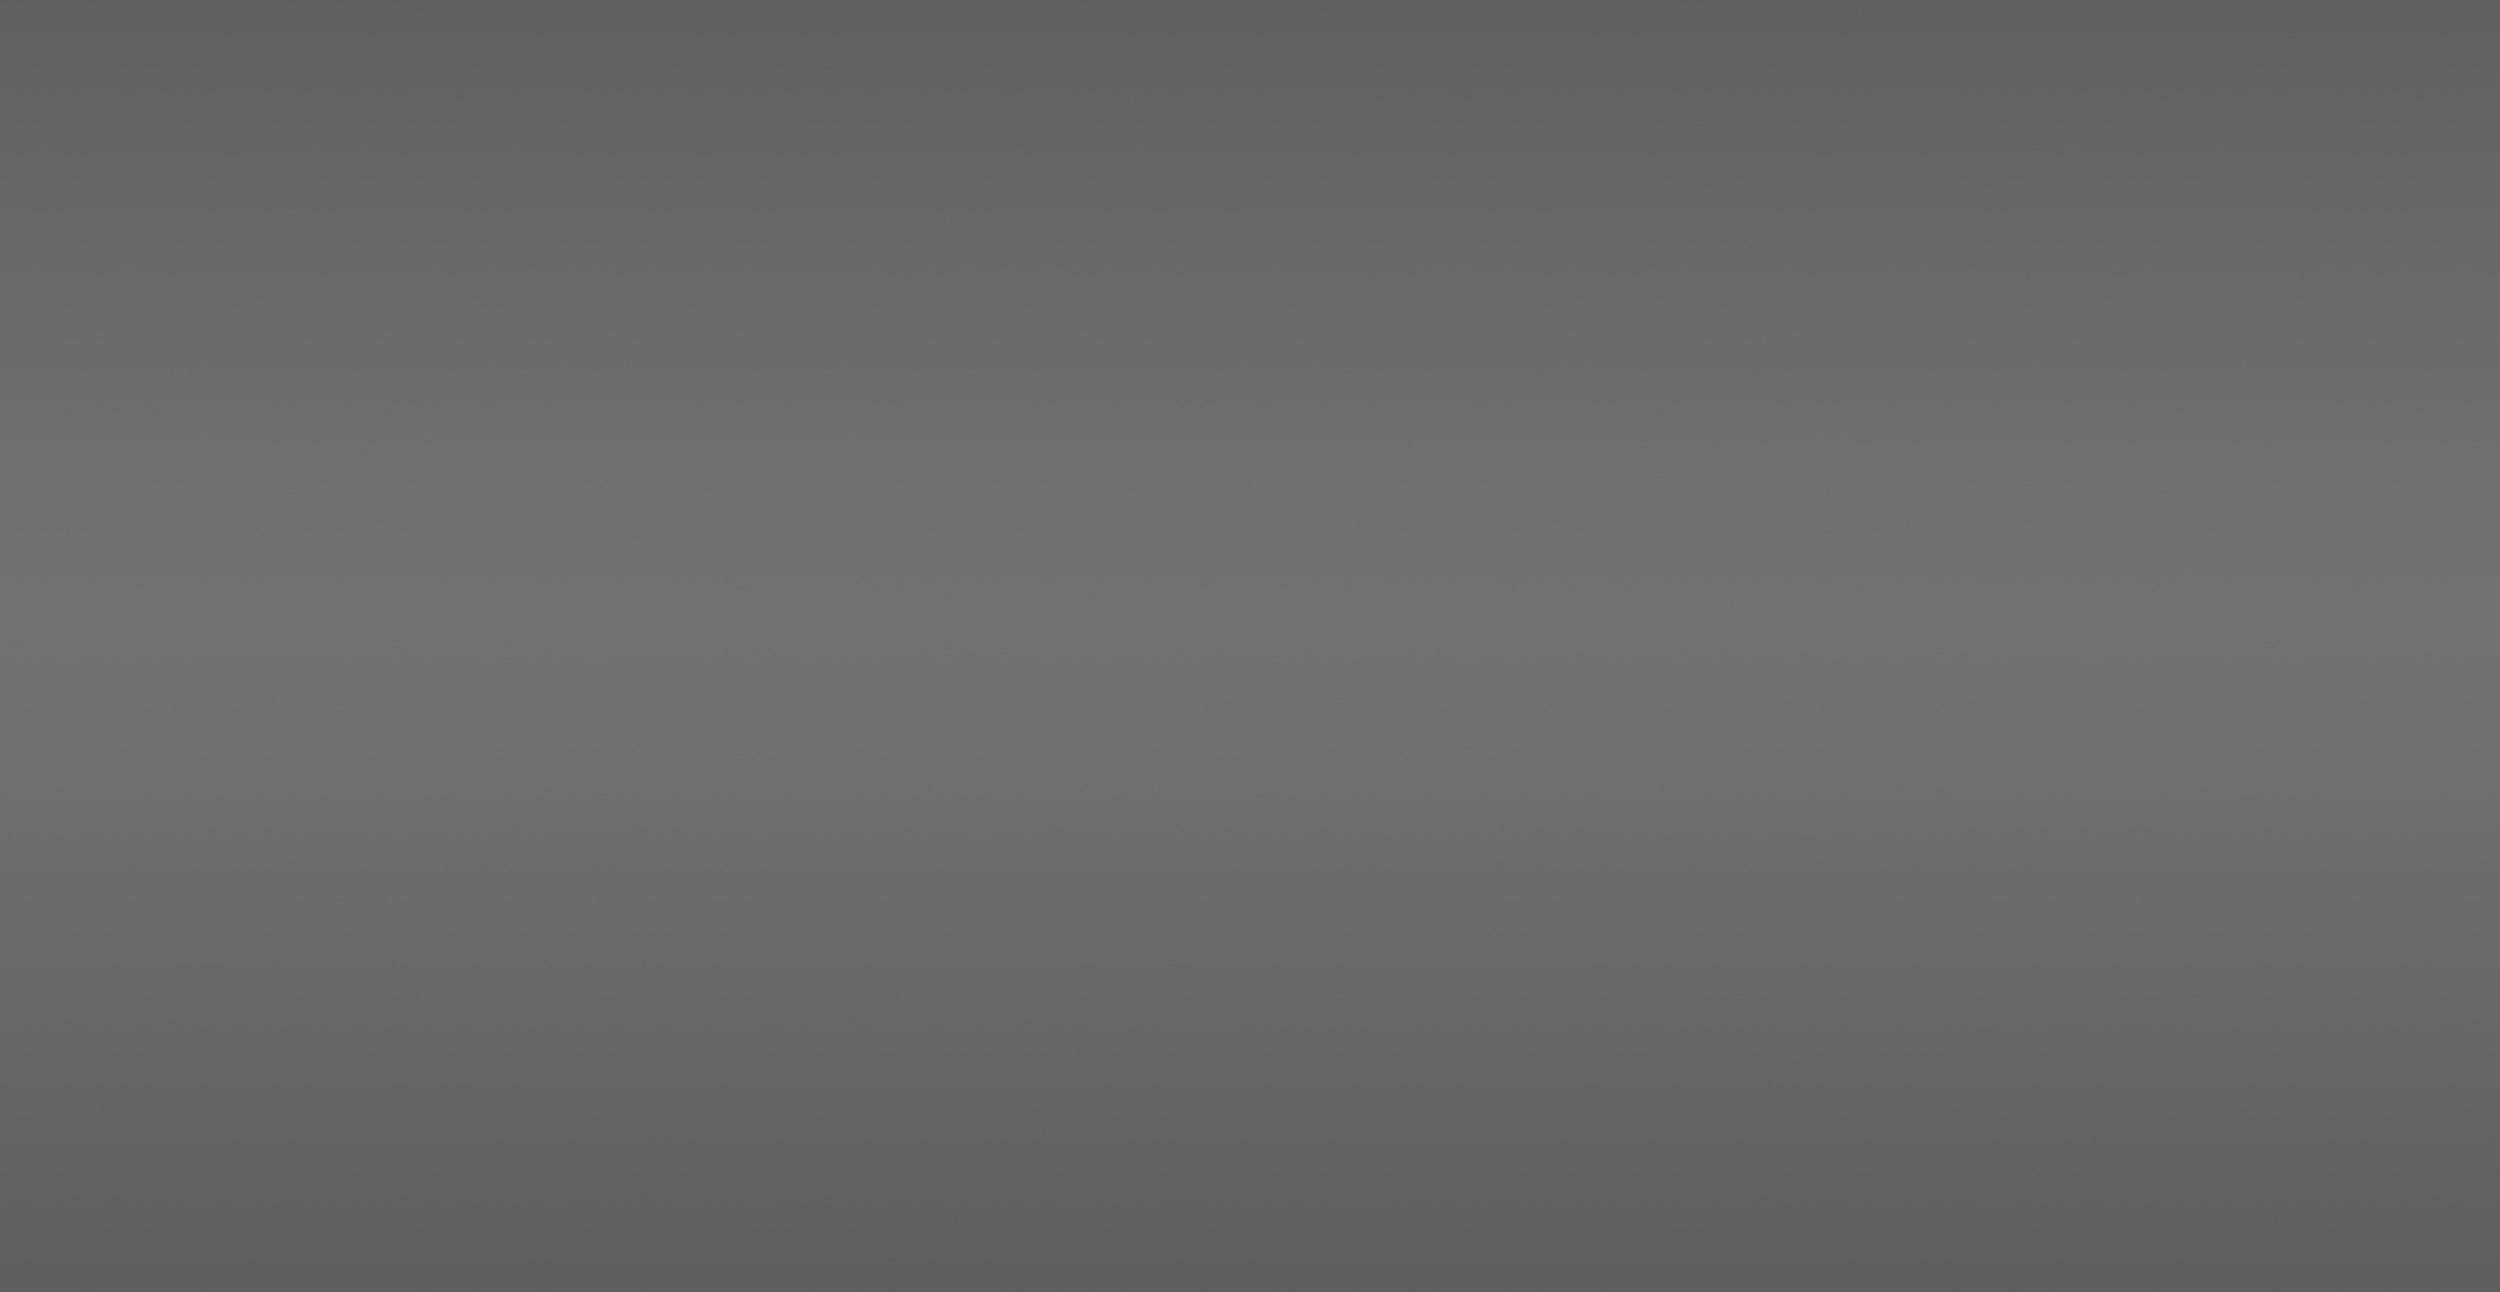 hexagon-gray2.jpg